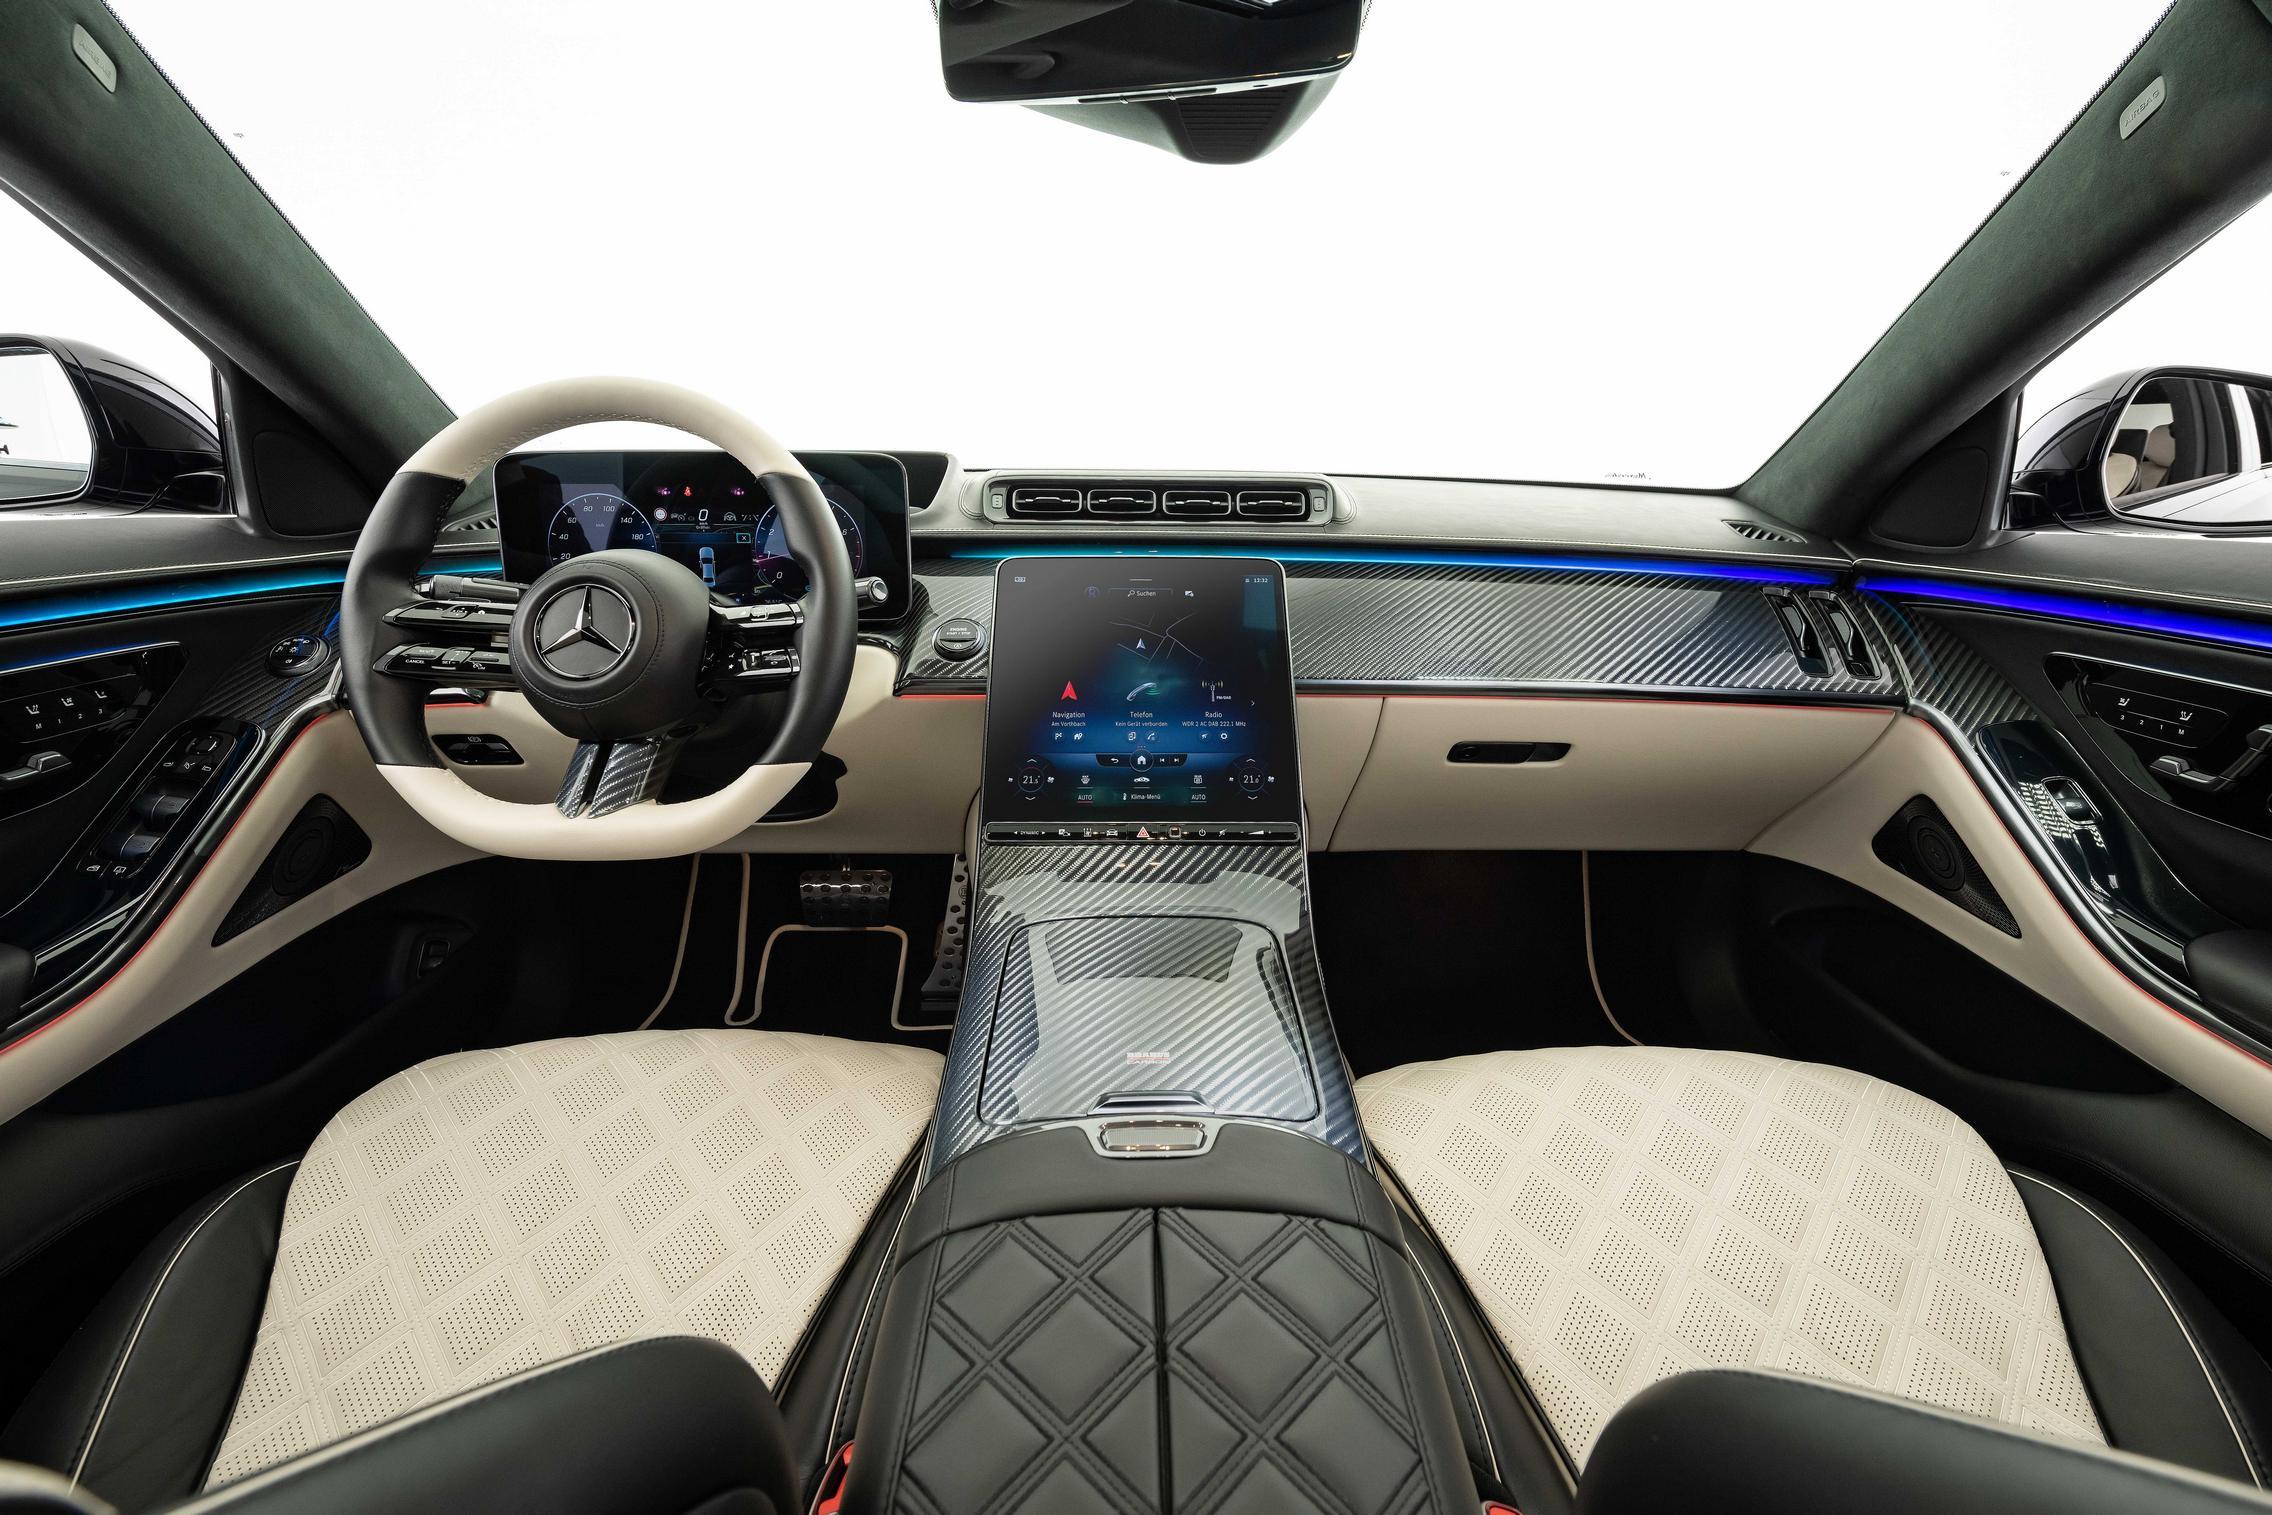 Brabus S Class interior screen